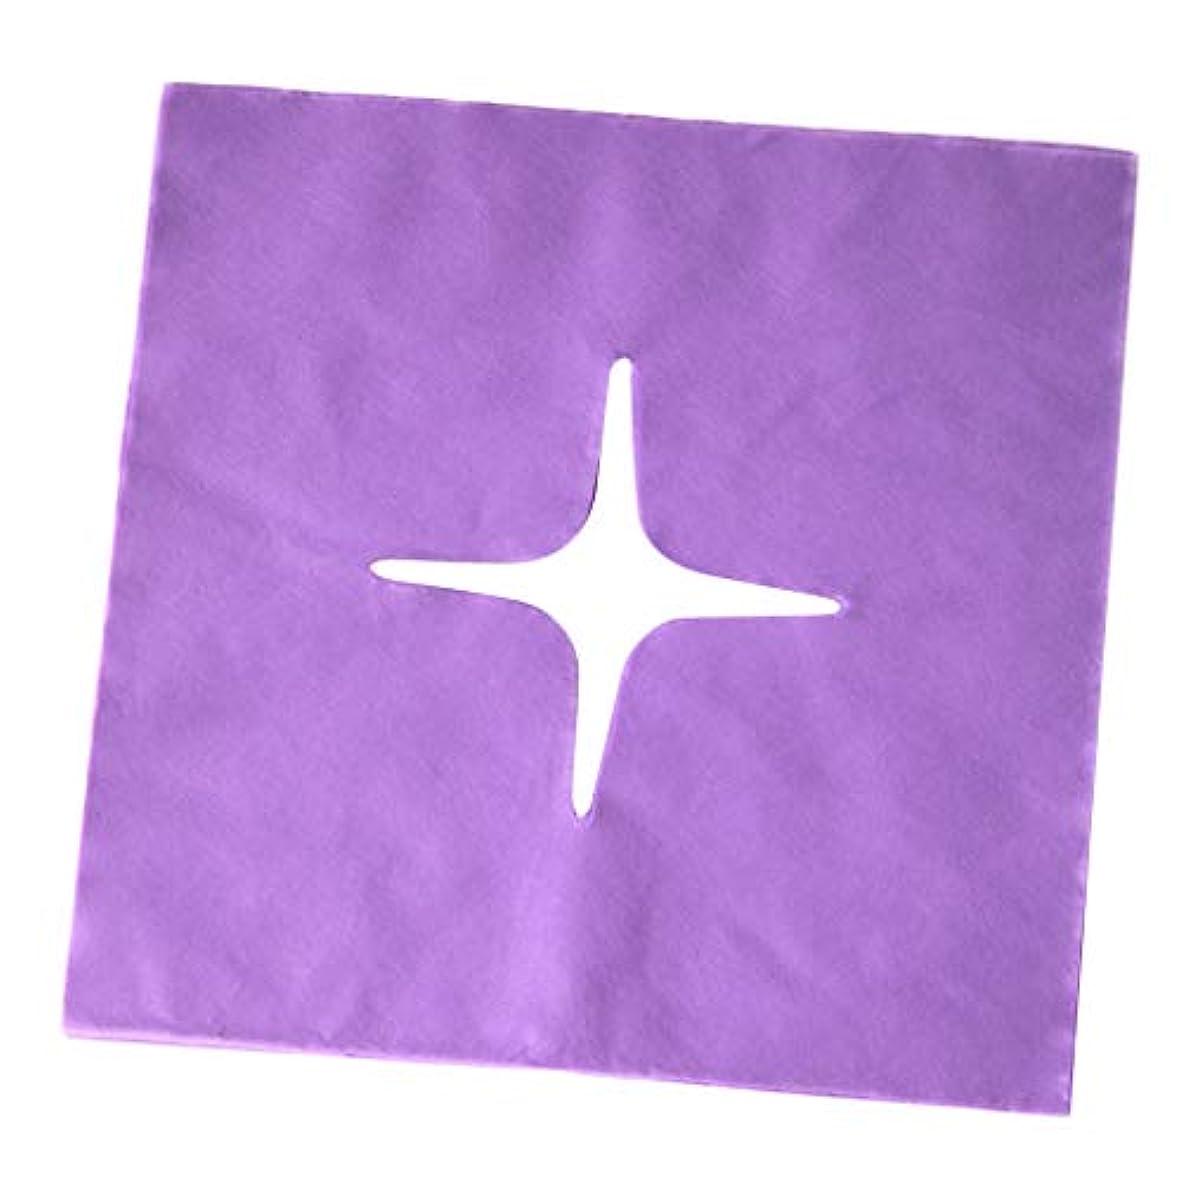 chiwanji マッサージ フェイスクレードルカバー スパ用 美容院 ビューティーサロン マッサージサロン 全3色 - 紫の